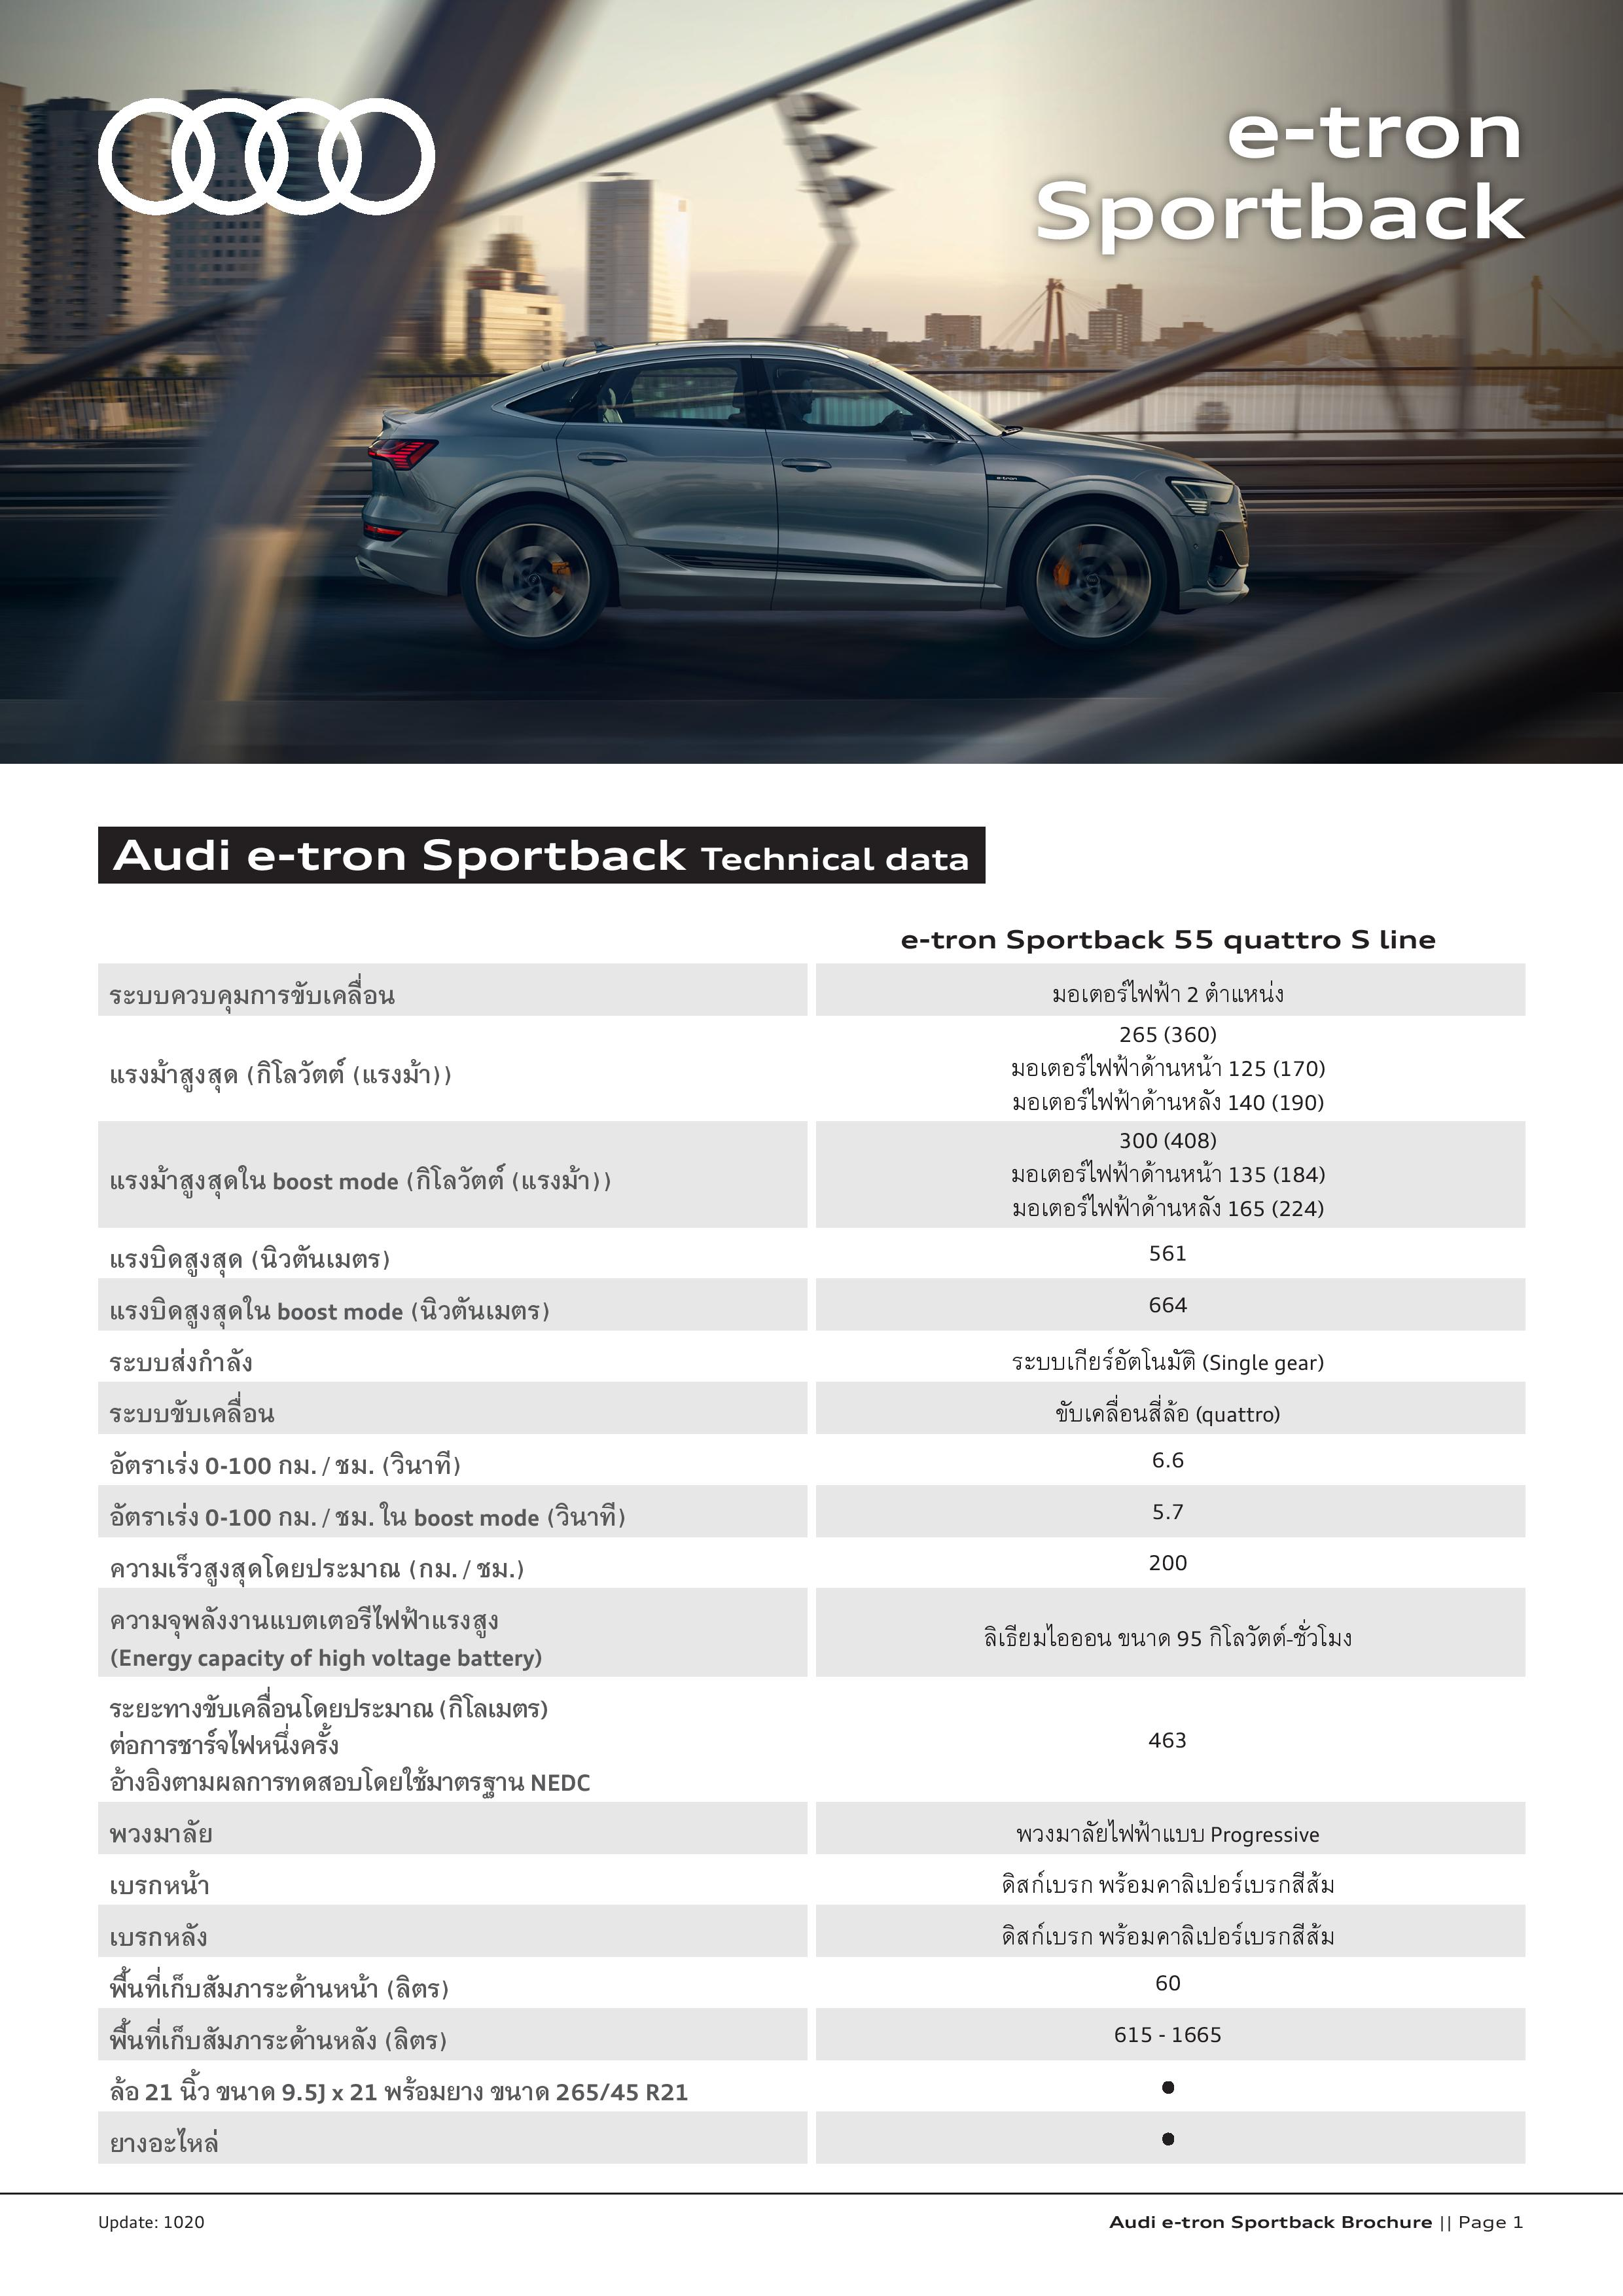 e-tron_Sportback_WebBrochure_Oct2020-page-001